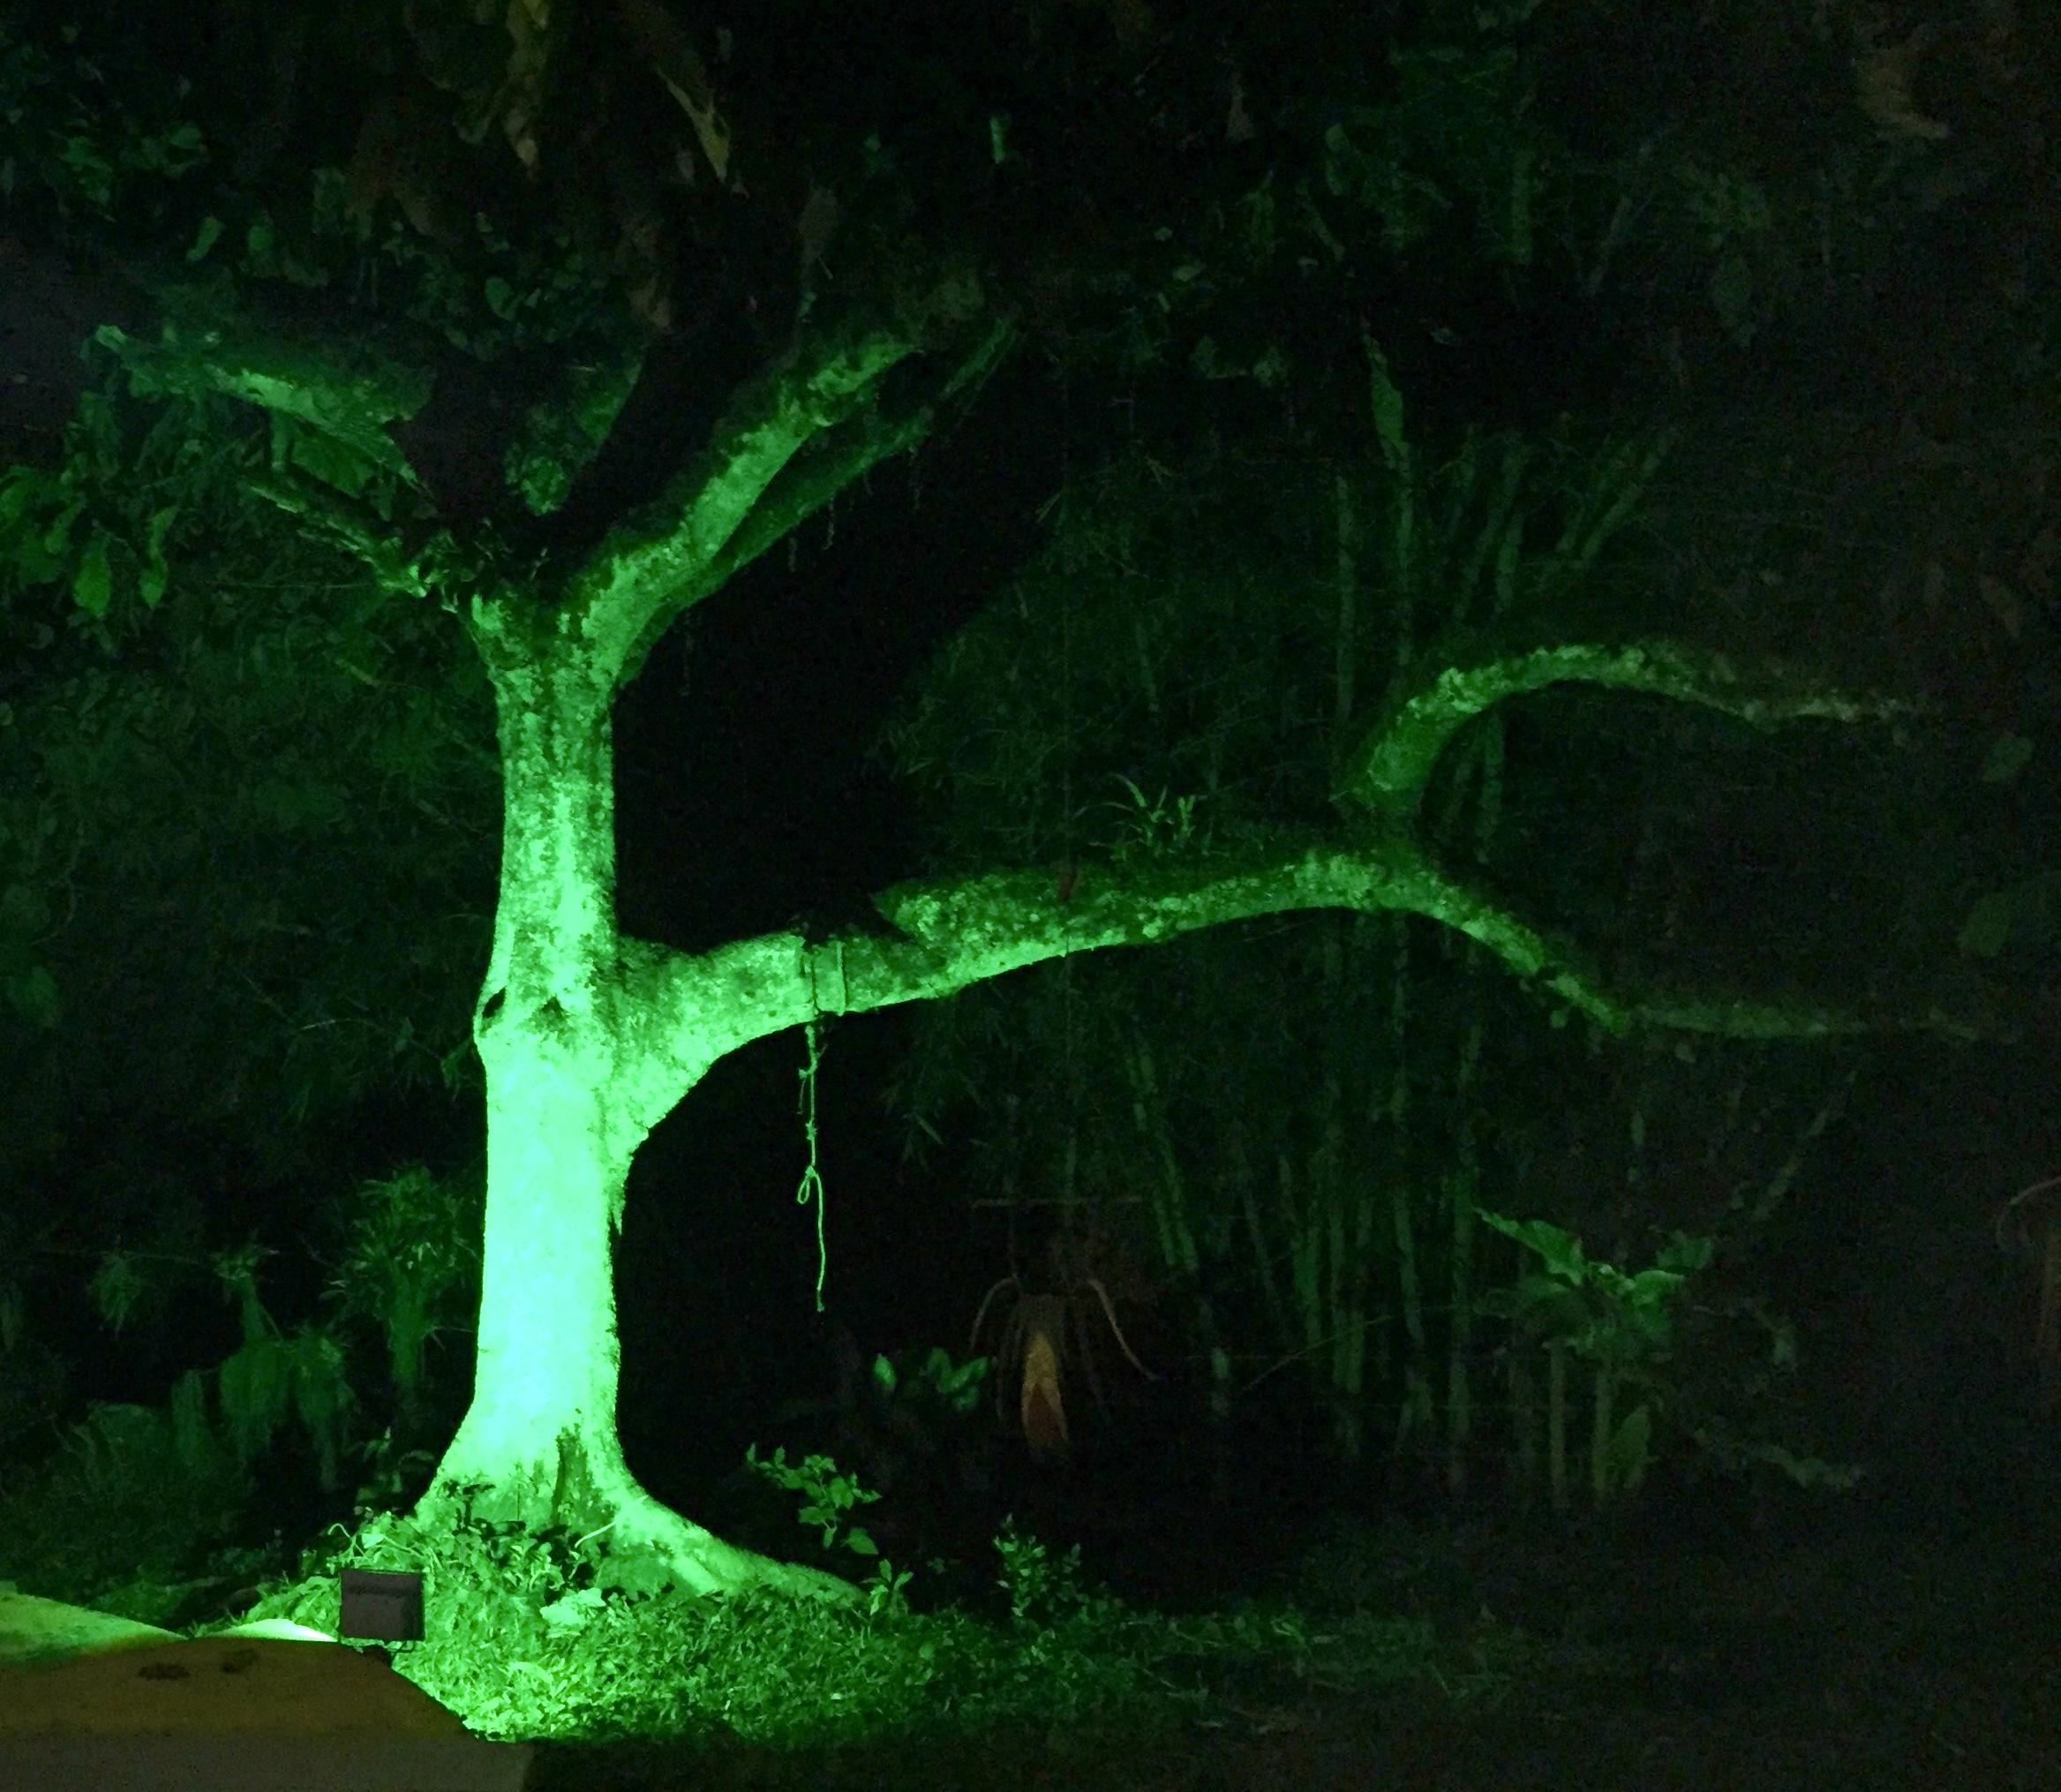 The hammock tree after dark looks surreal illuminated by a green spotlight.